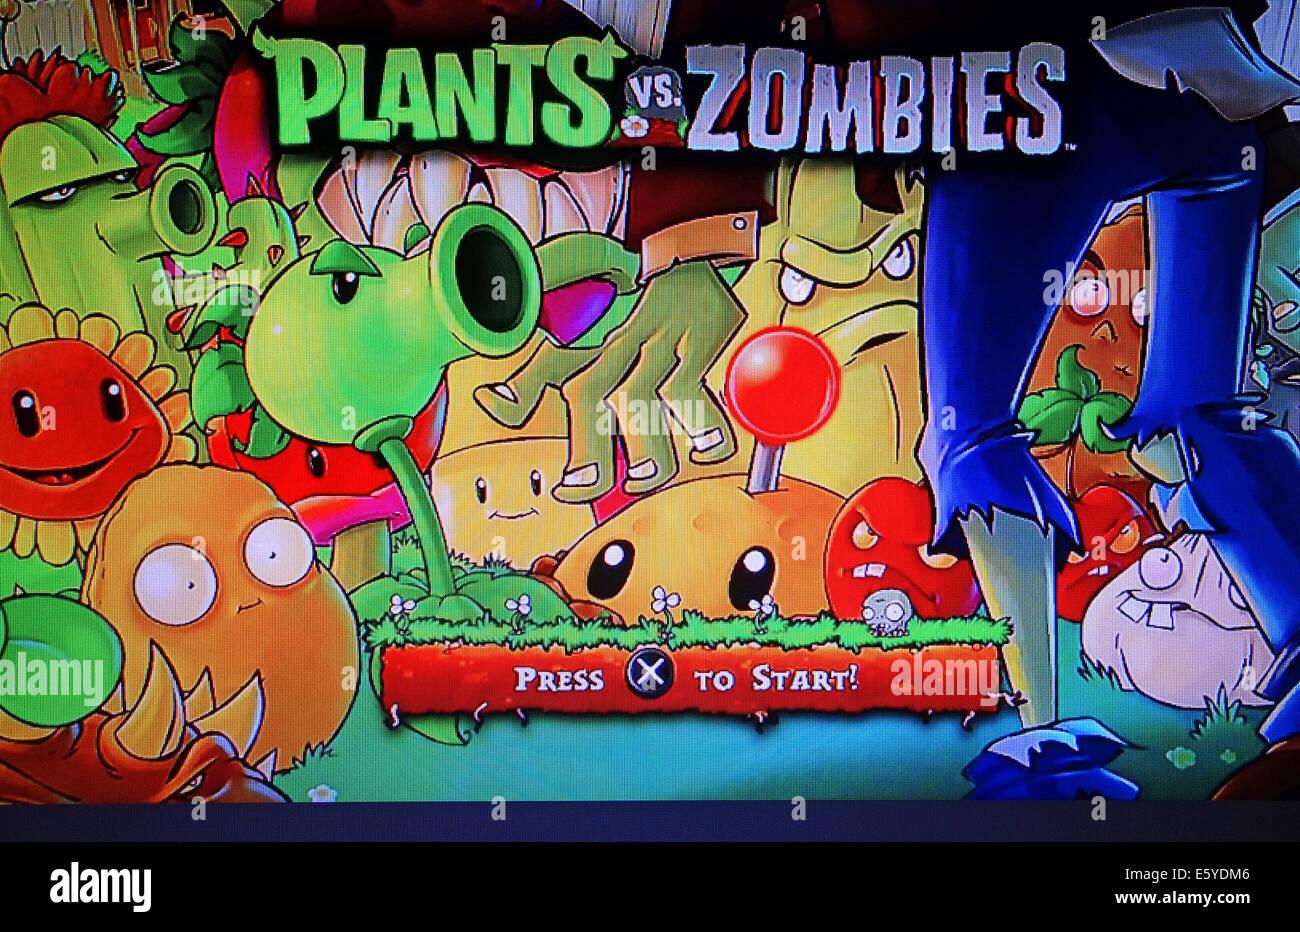 screenshot of Plants vs Zombies computer game - Stock Image